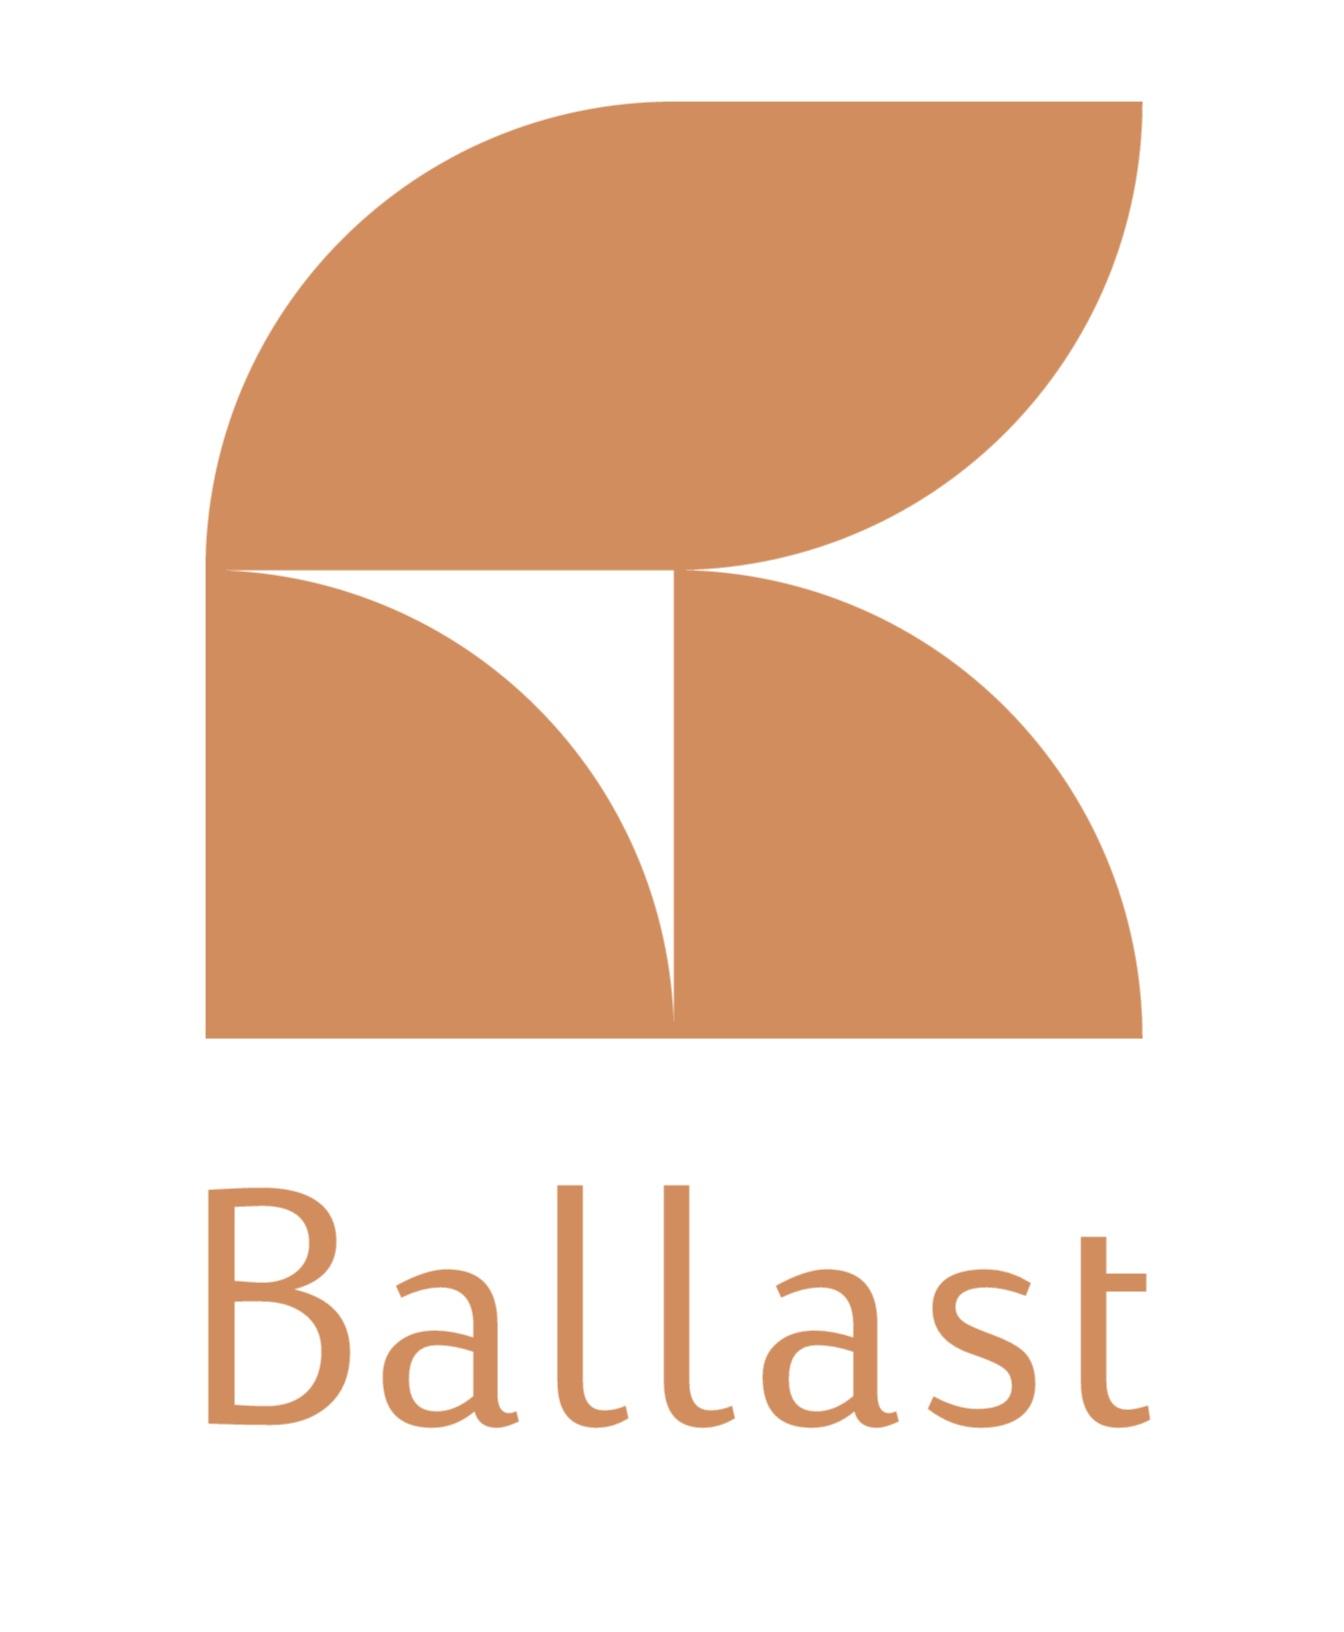 Ballast_StackLogo_Copper.jpg